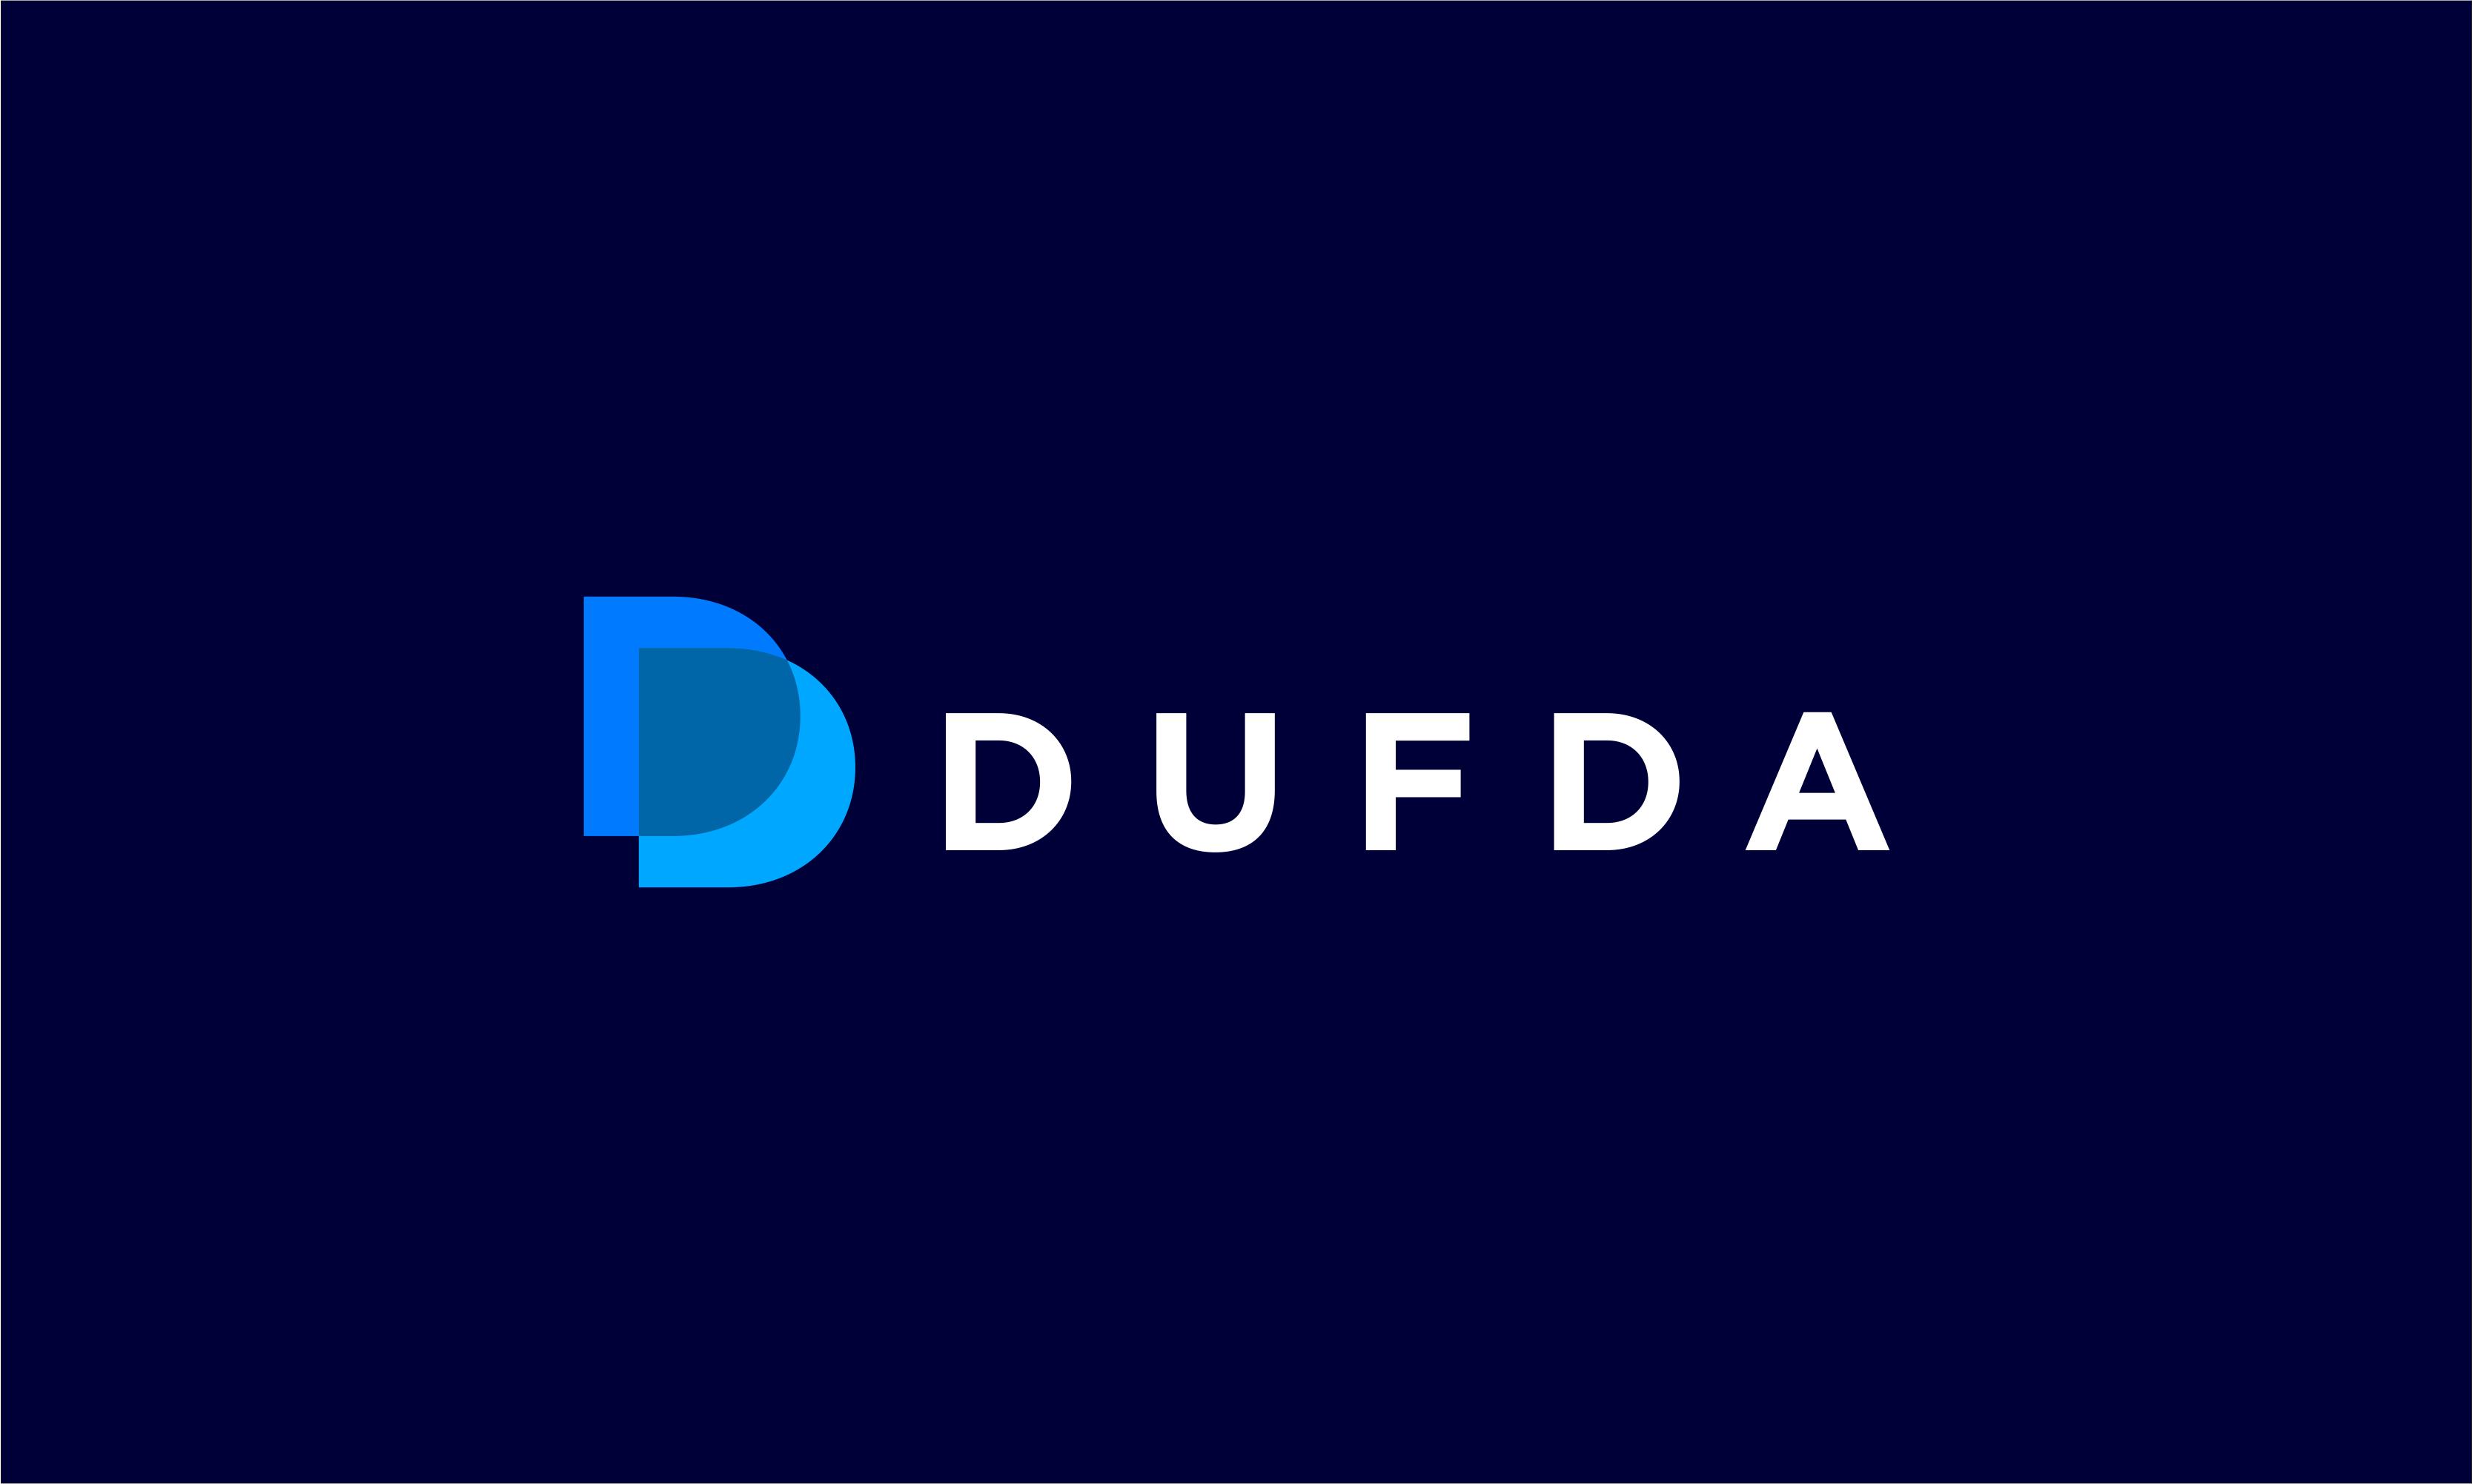 Dufda - Environmentally-friendly startup name for sale